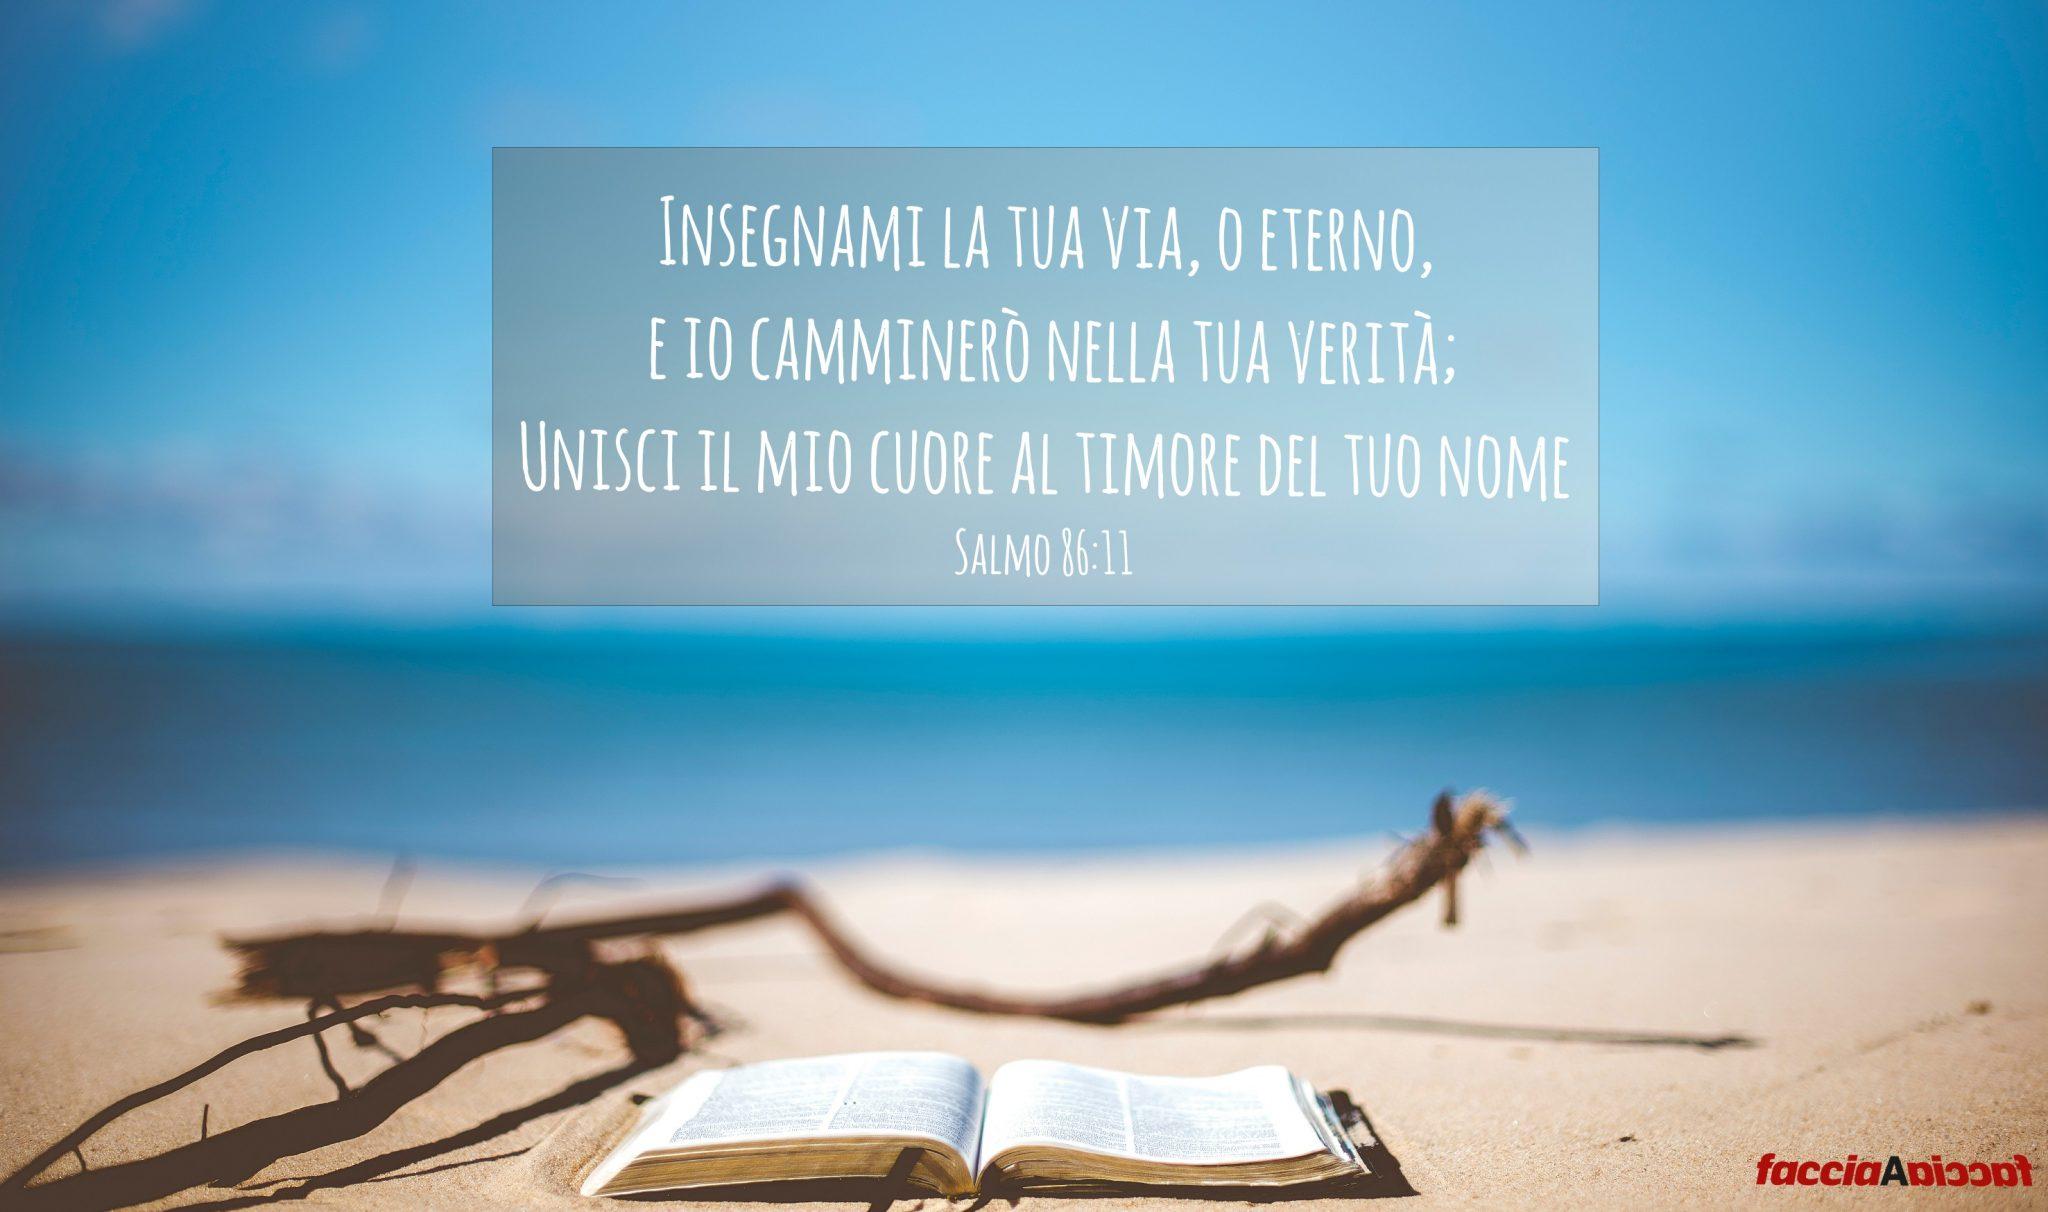 salmo 86-11